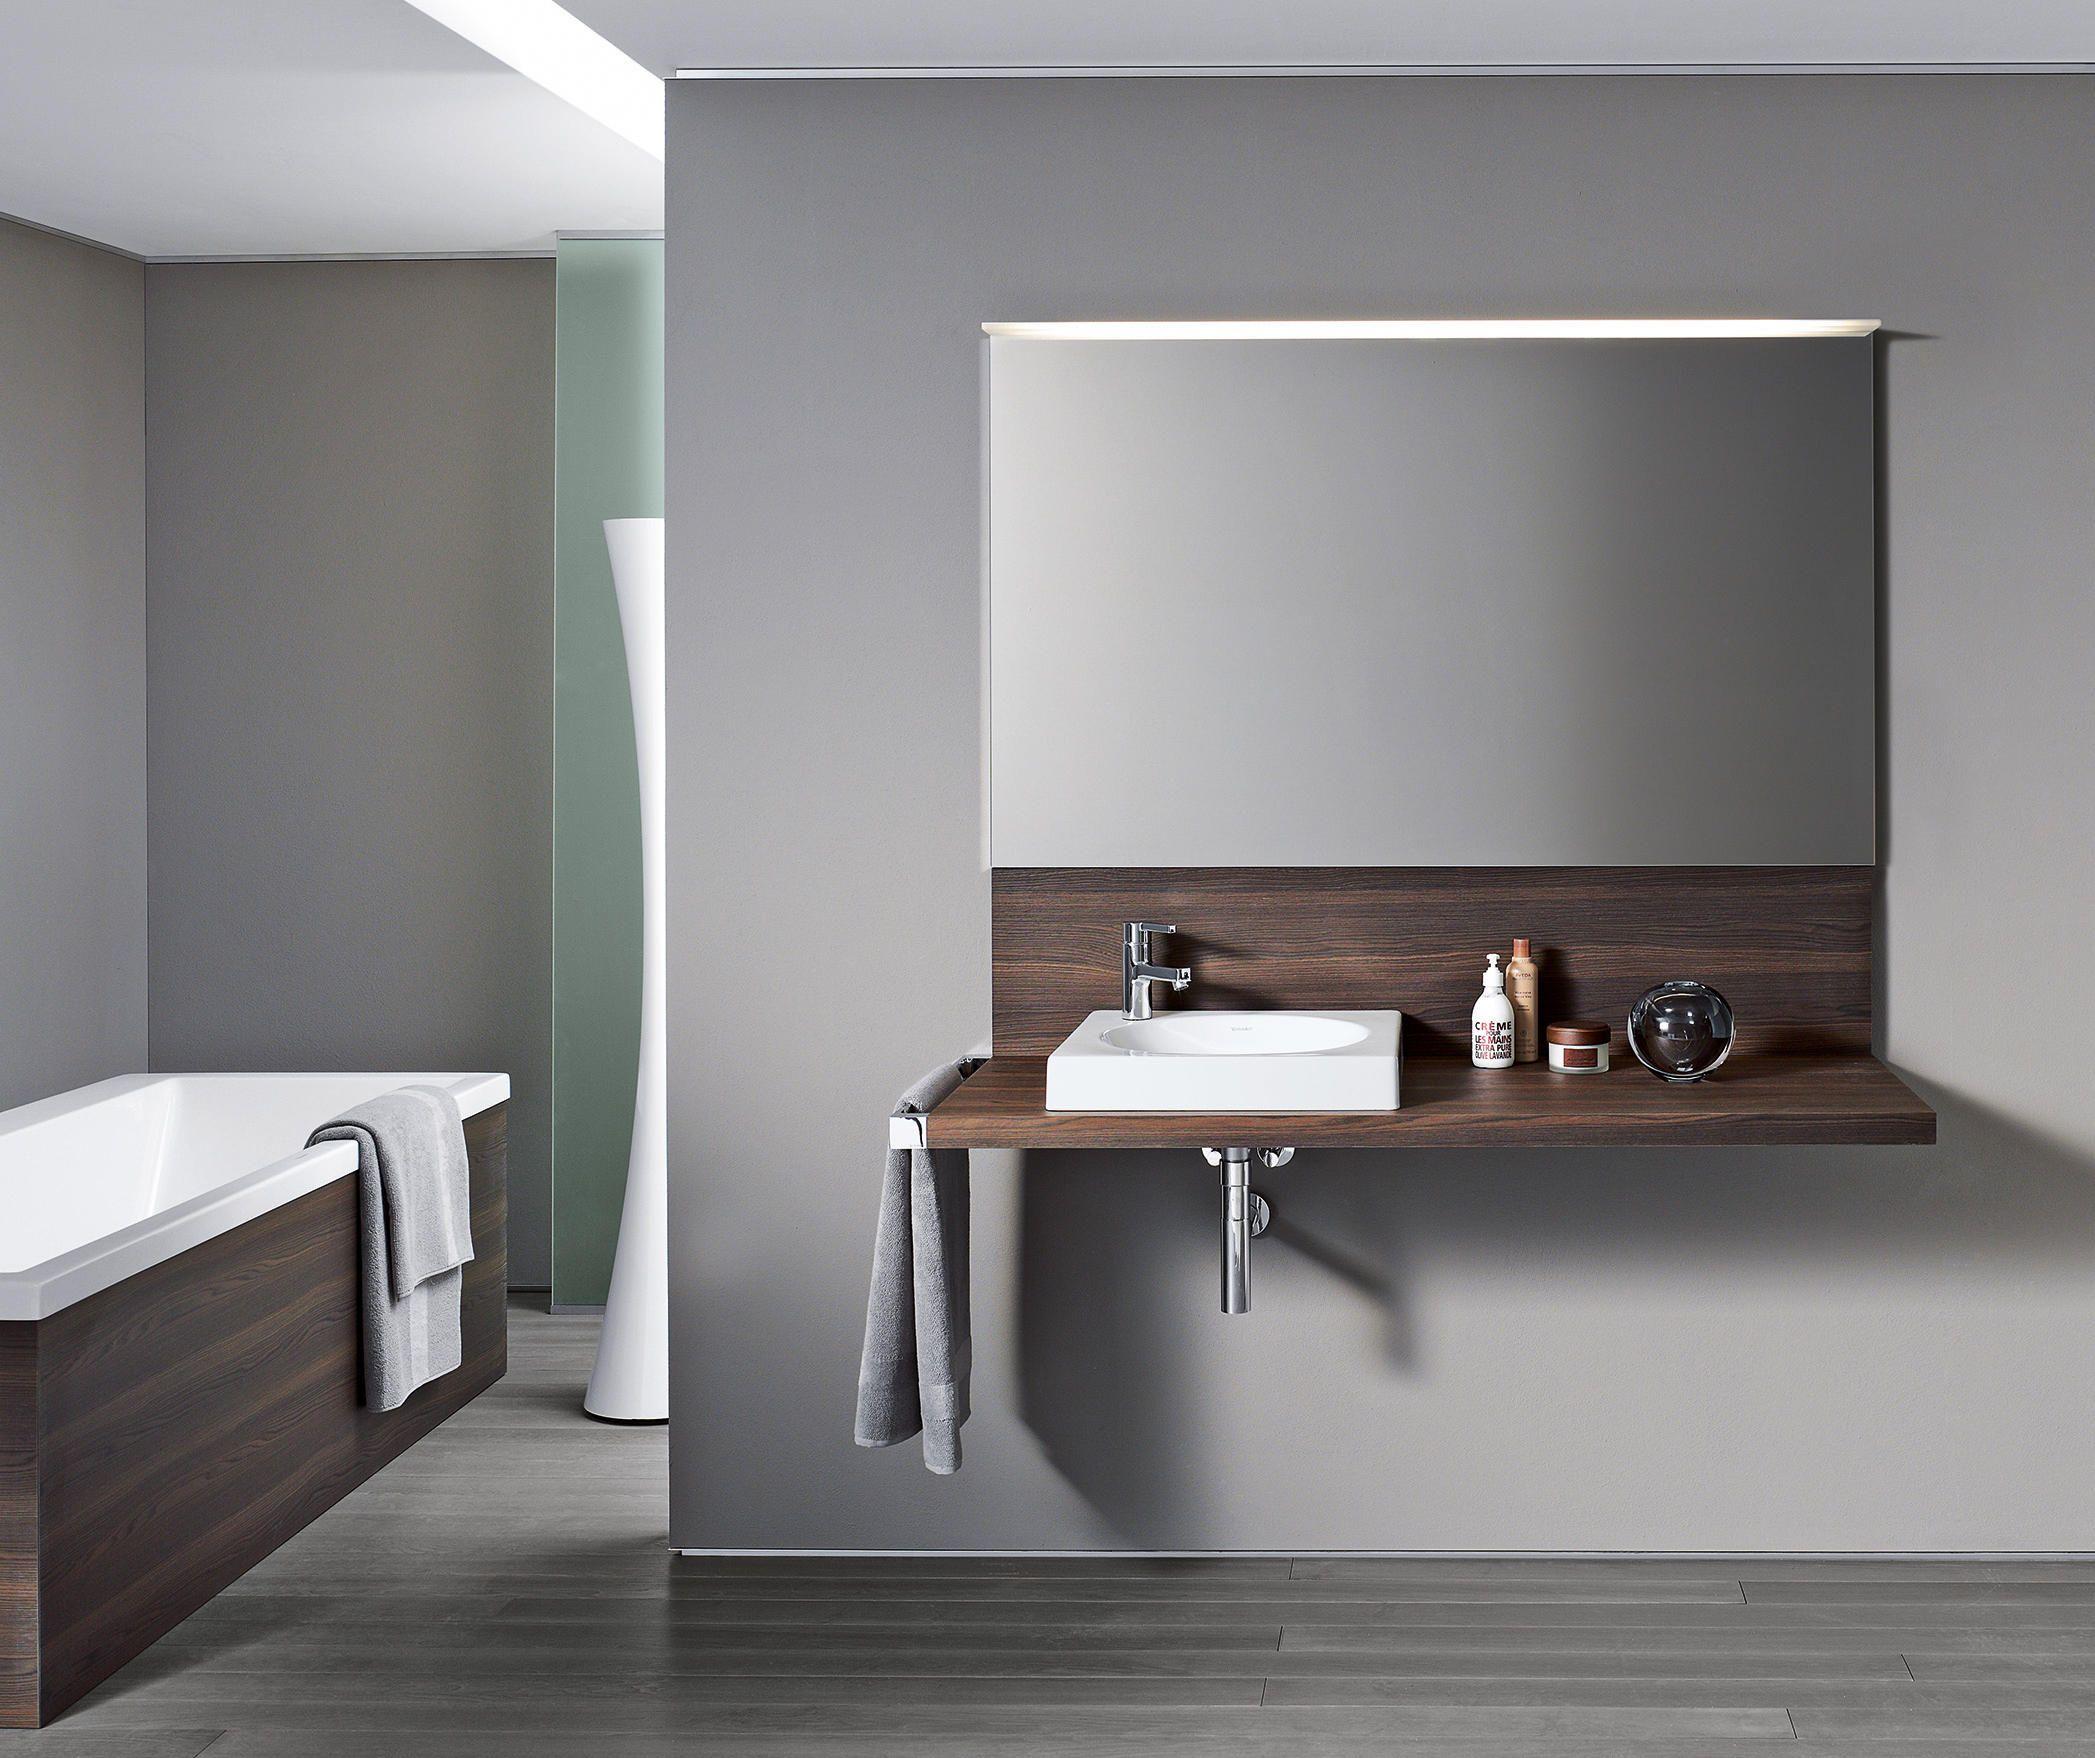 Designer Vanity Units For Bathroom Unique Delos Console With Back Panel  Designer Vanity Units From Duravit Design Decoration